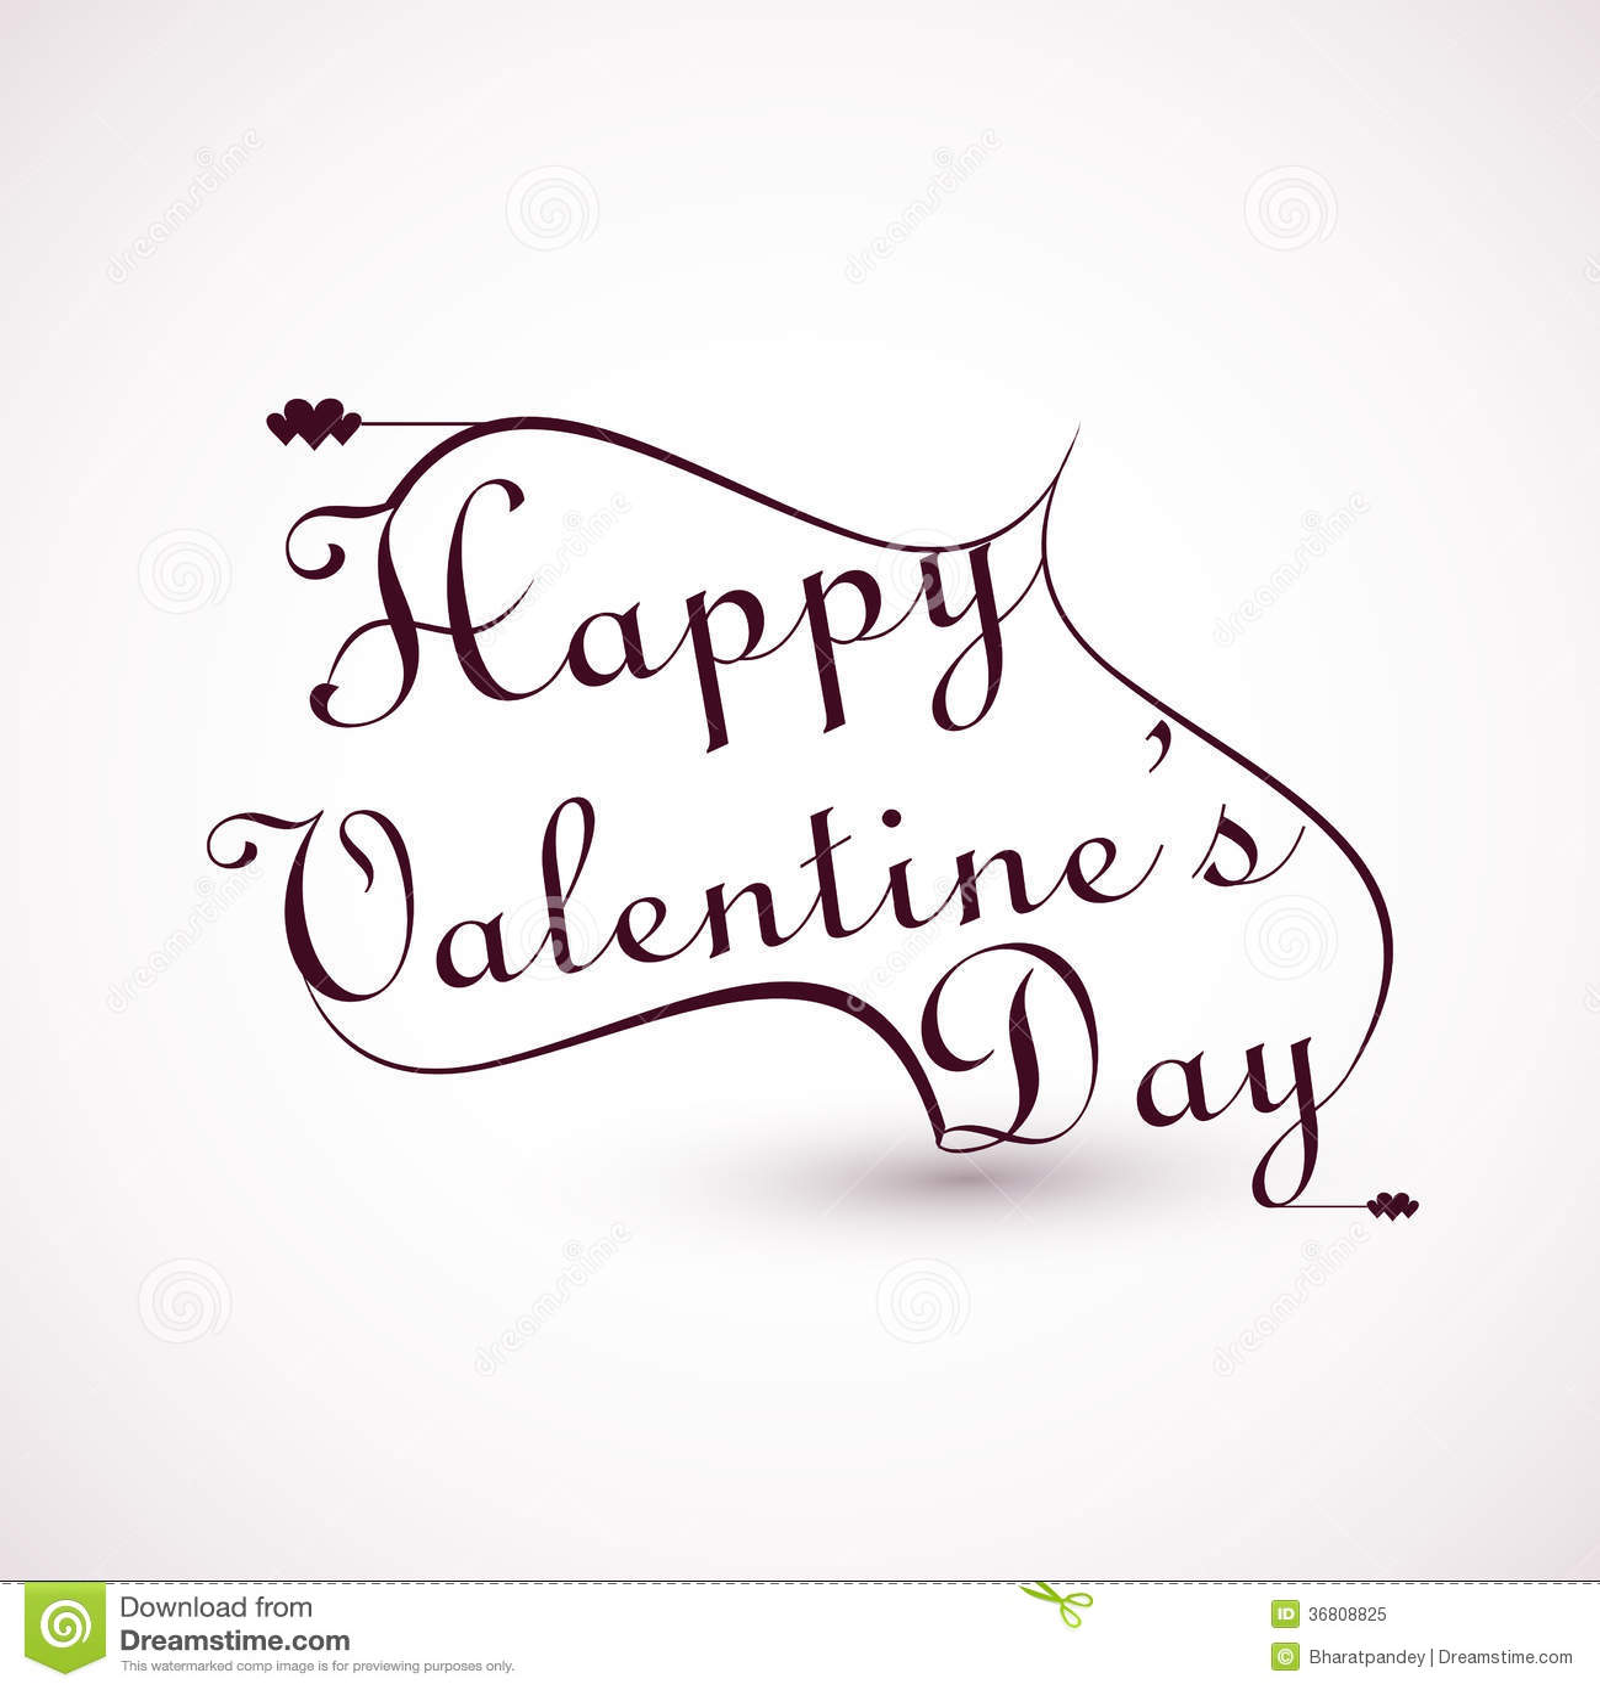 Happy Valentines Day Calligraphic Font Stock Vector Illustration